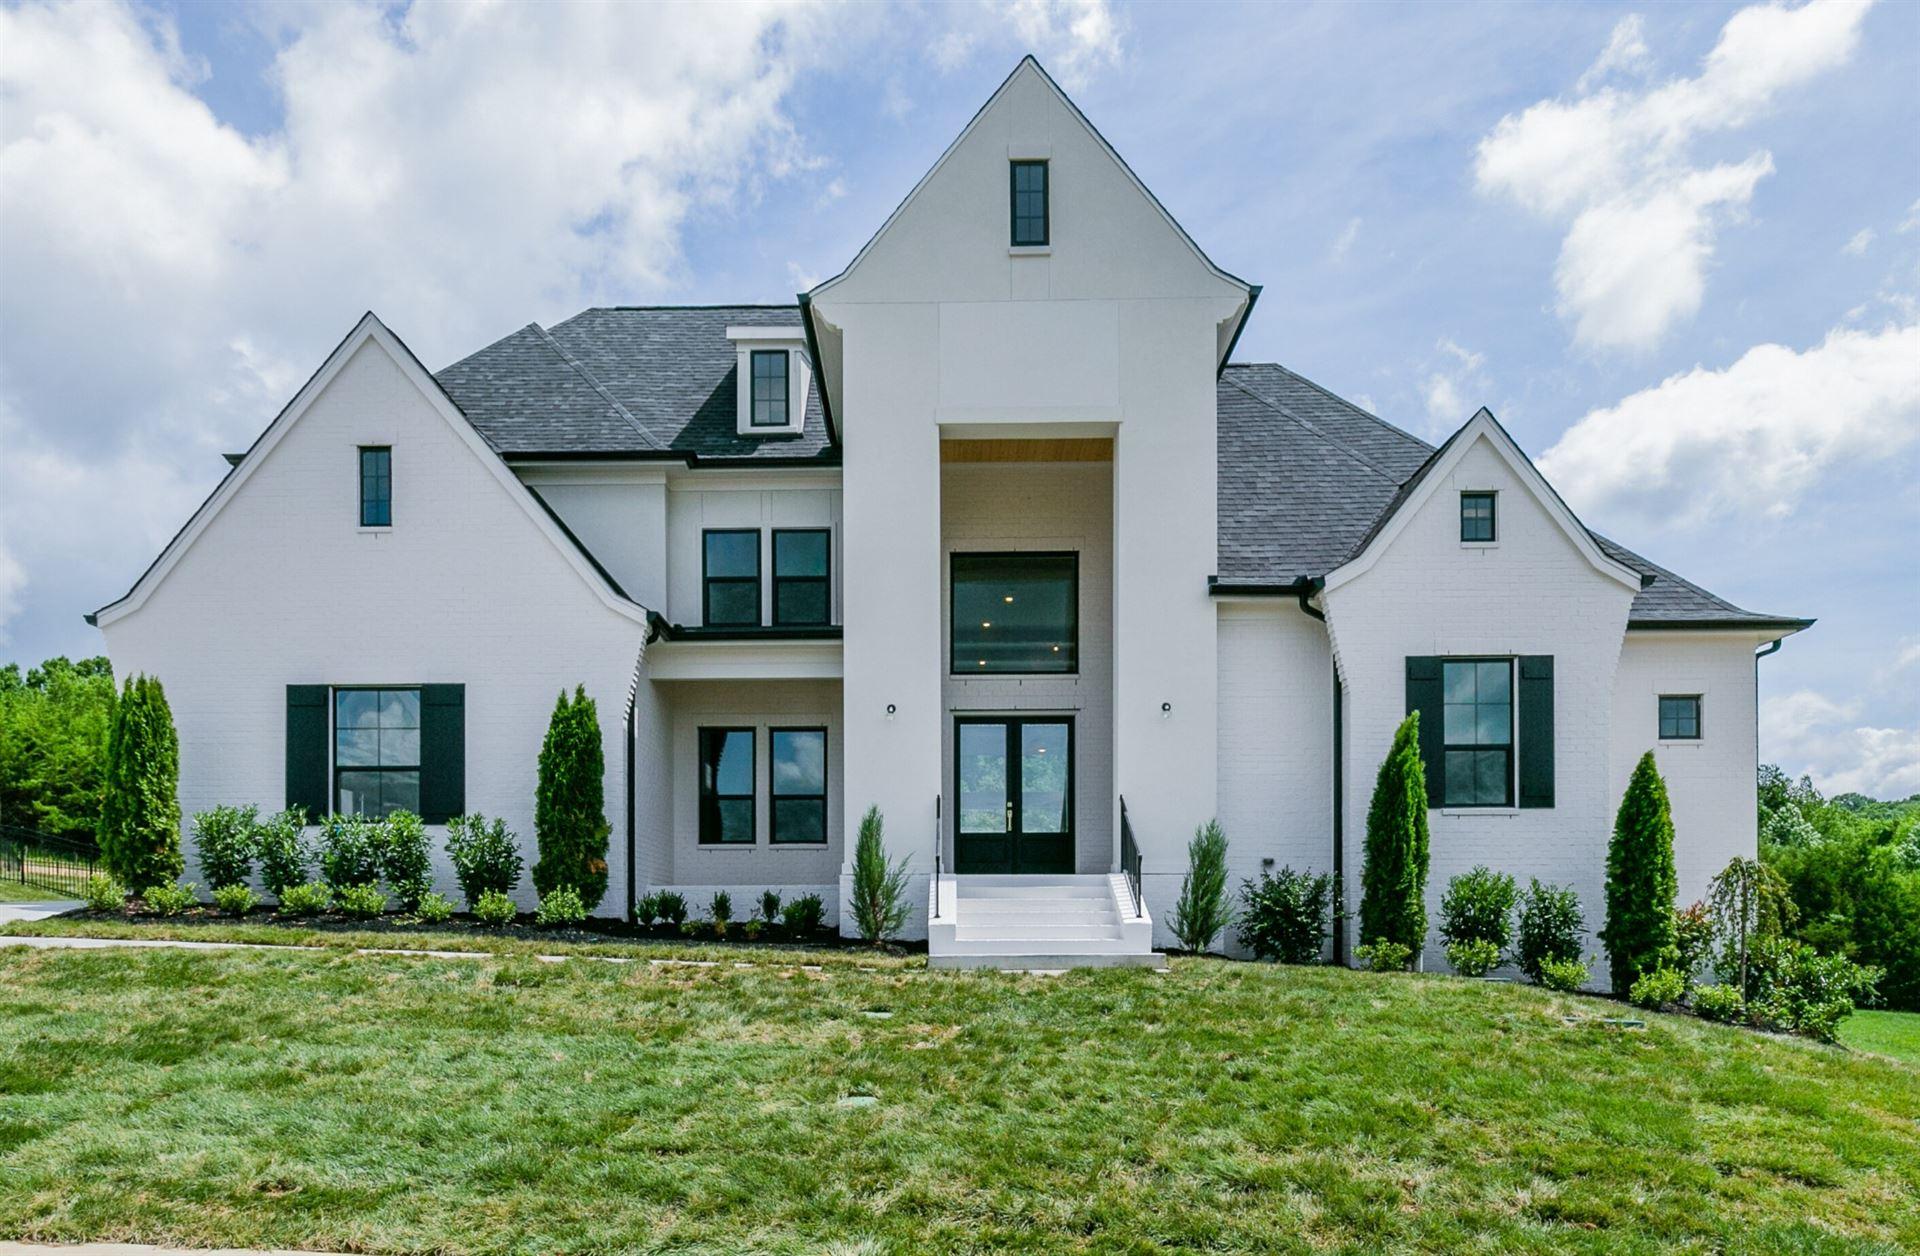 1004 Heights Blvd, Brentwood, TN 37027 - MLS#: 2236130